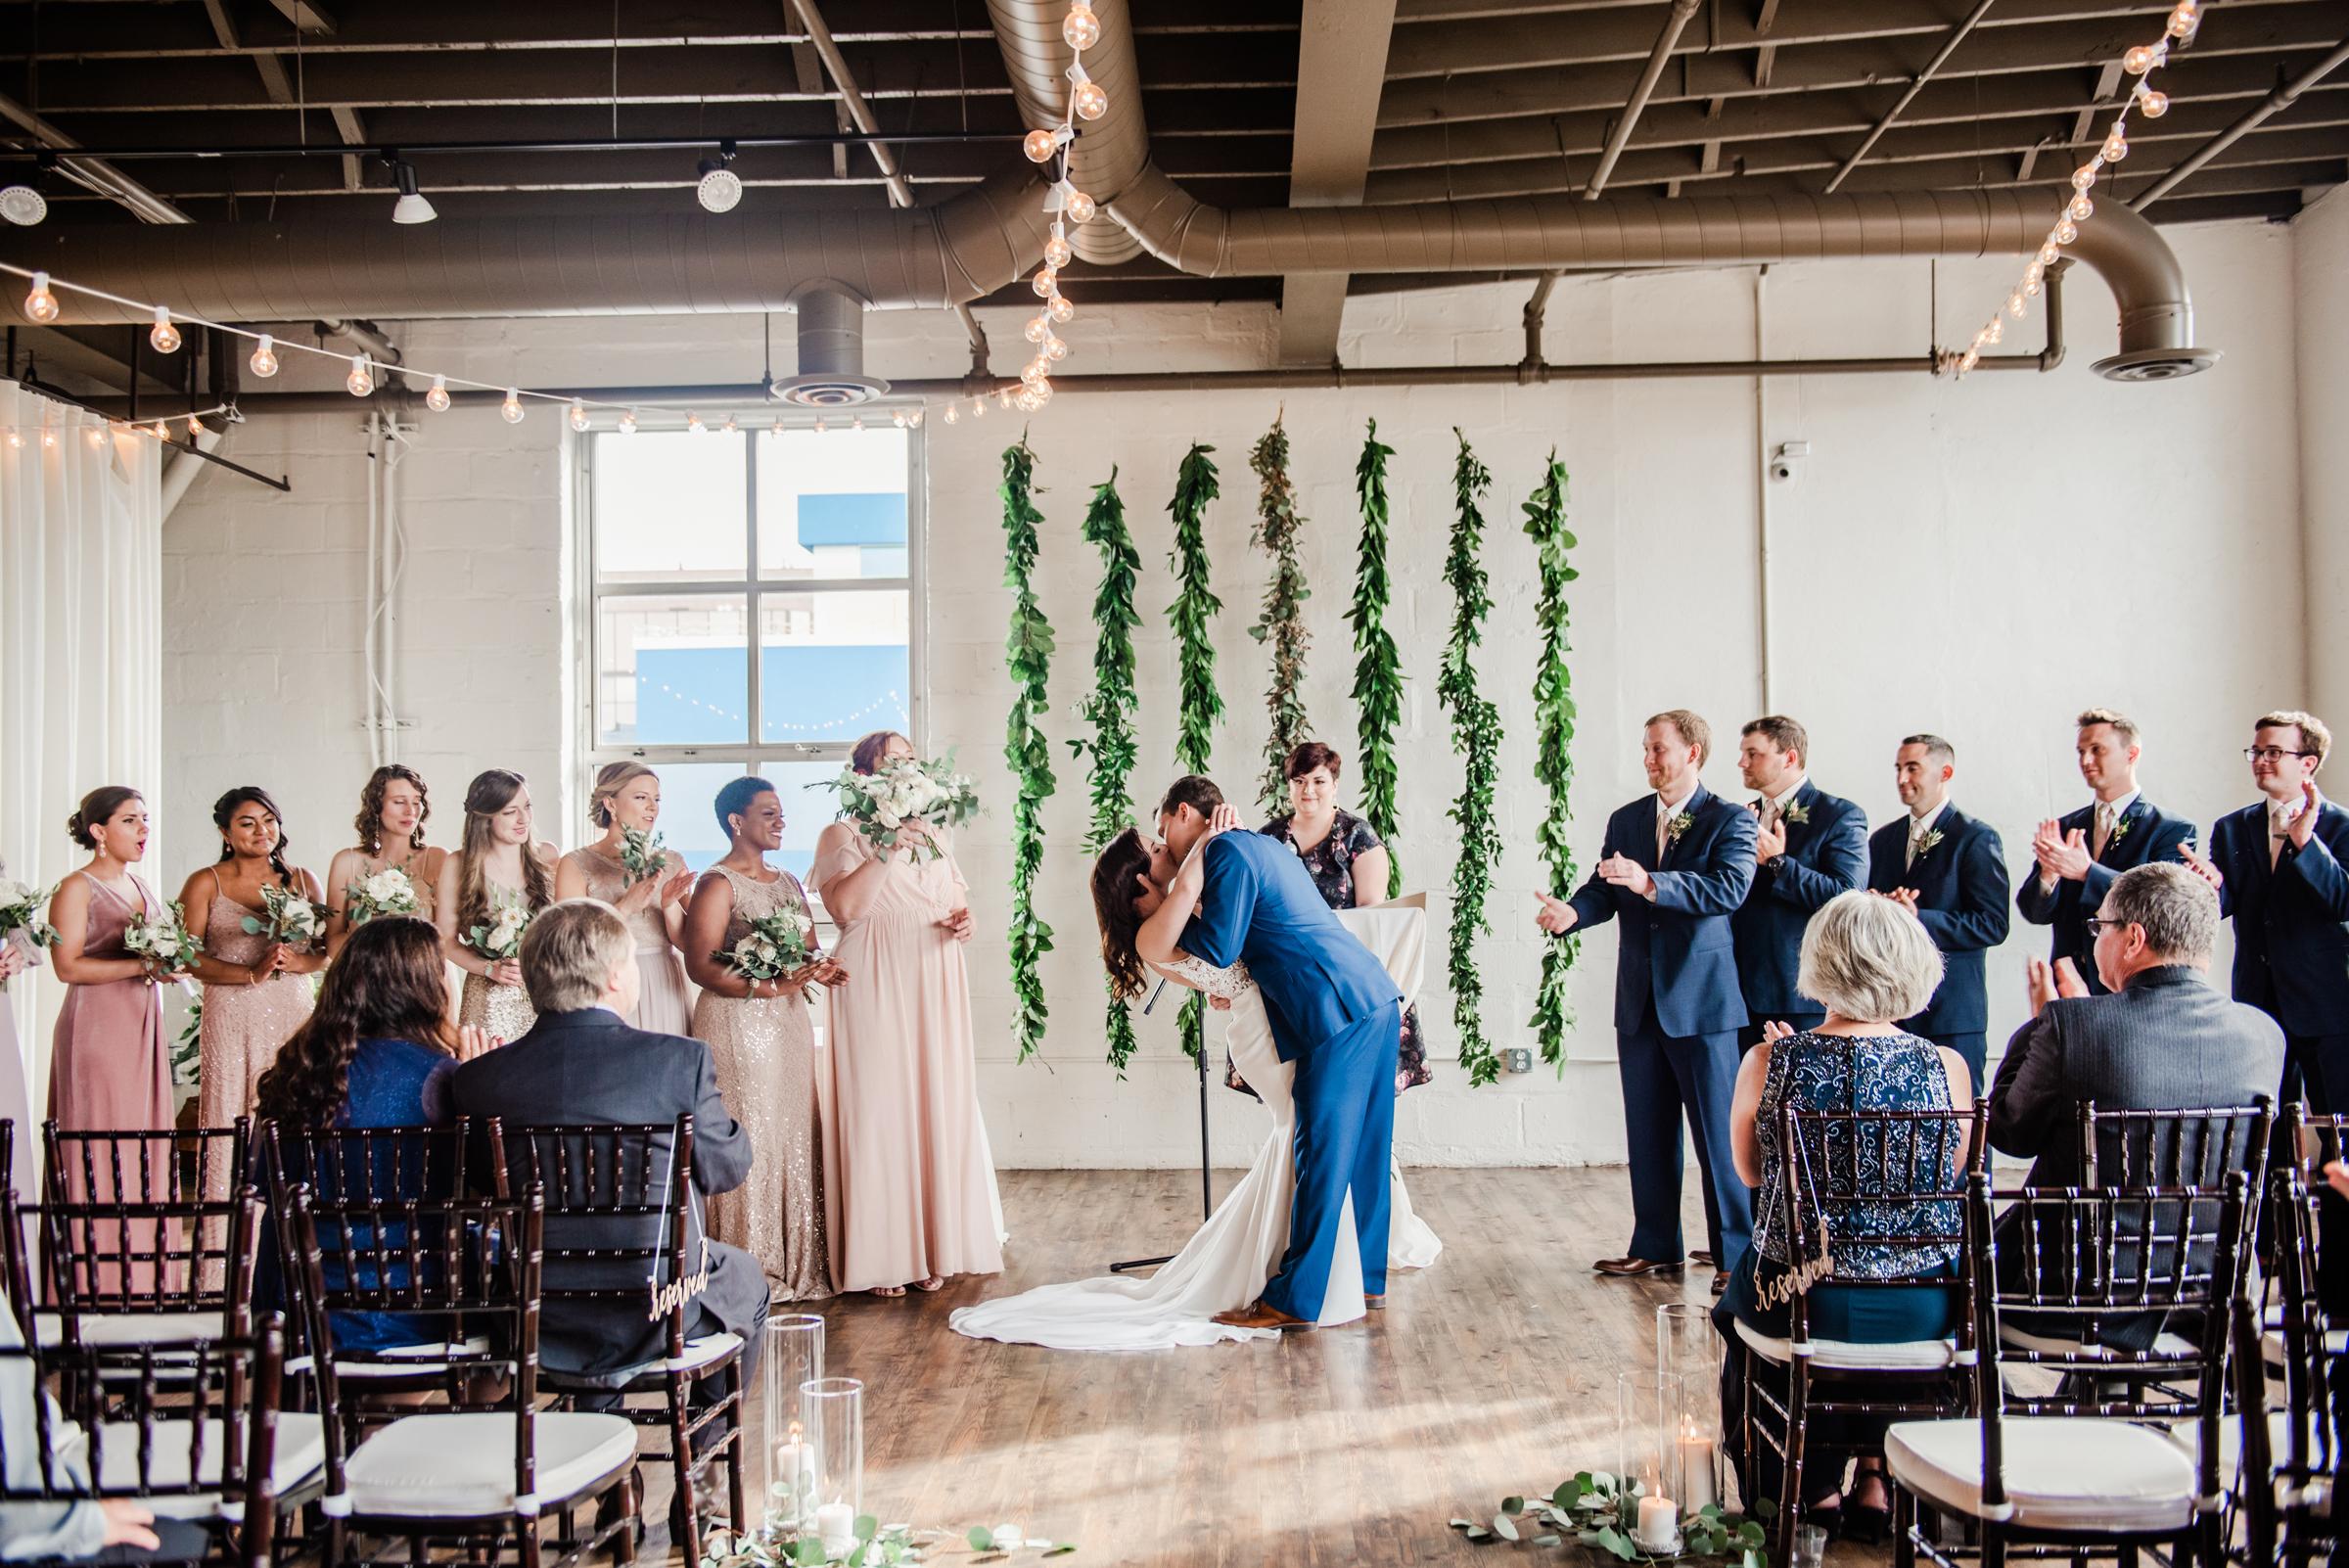 The_Arbor_LoftRochester_Wedding_JILL_STUDIO_Rochester_NY_Photographer_171655.jpg